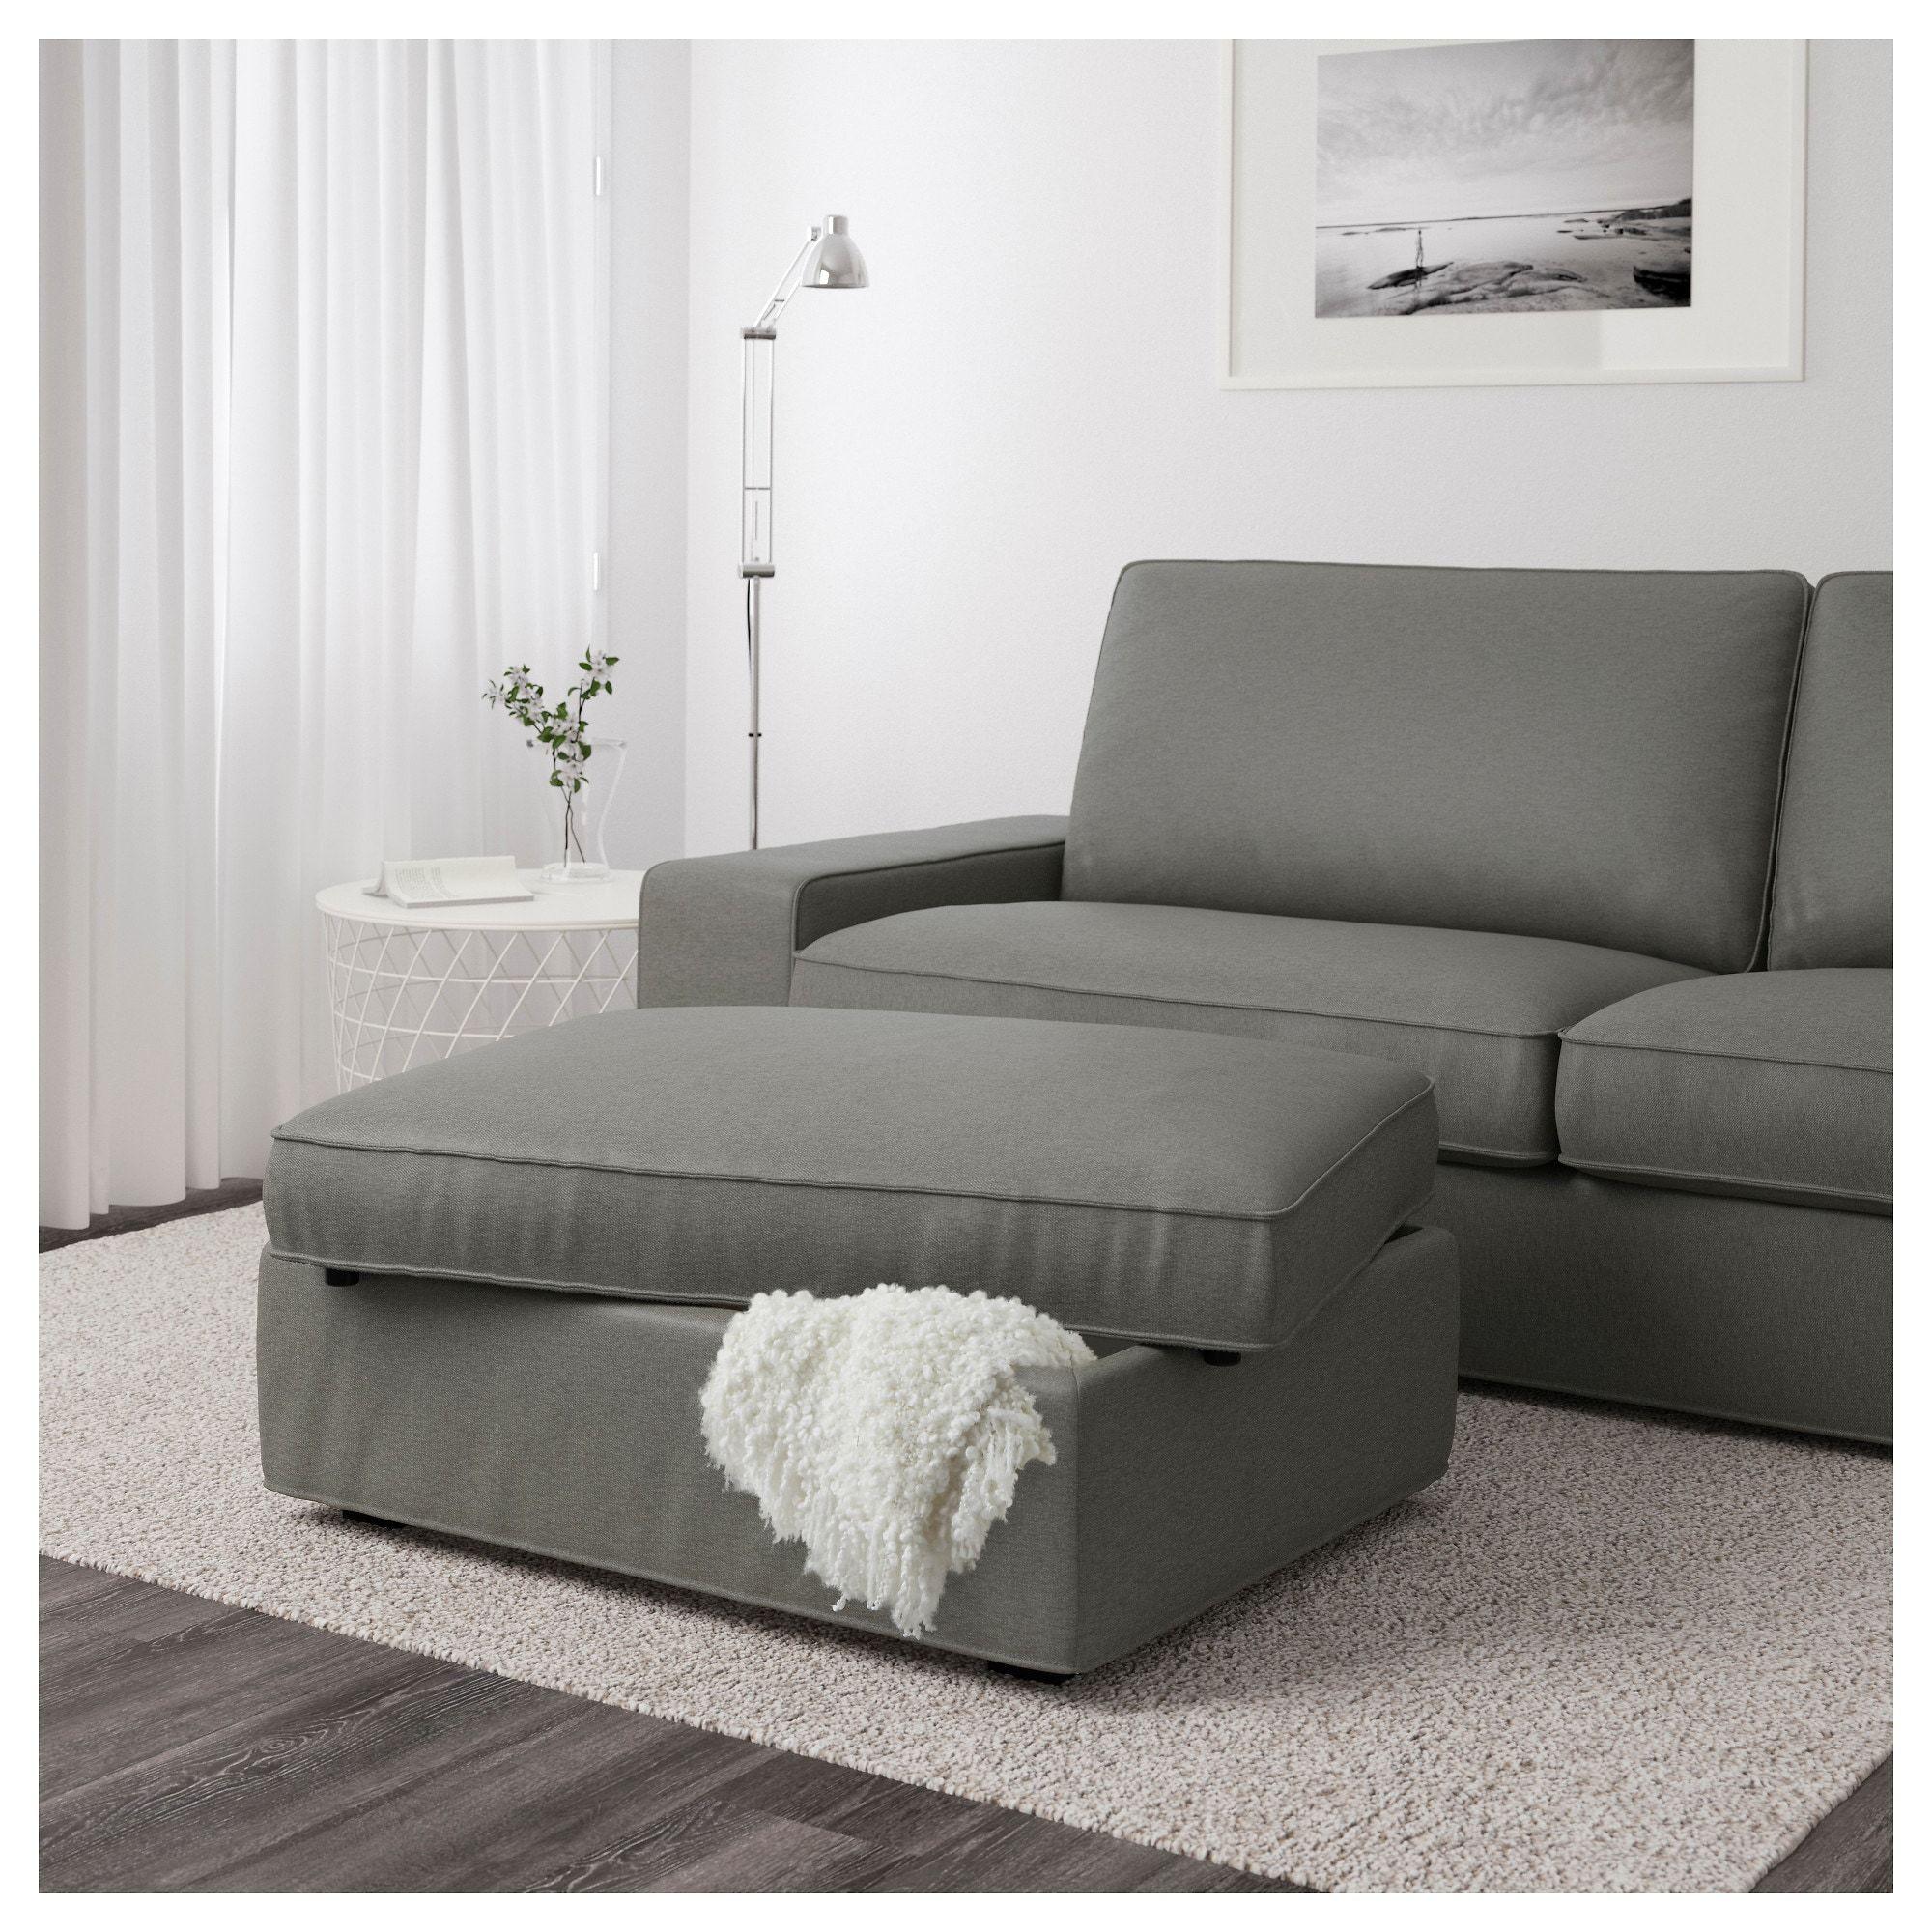 Ikea Kivik Borred Gray Green Ottoman With Storage Storage